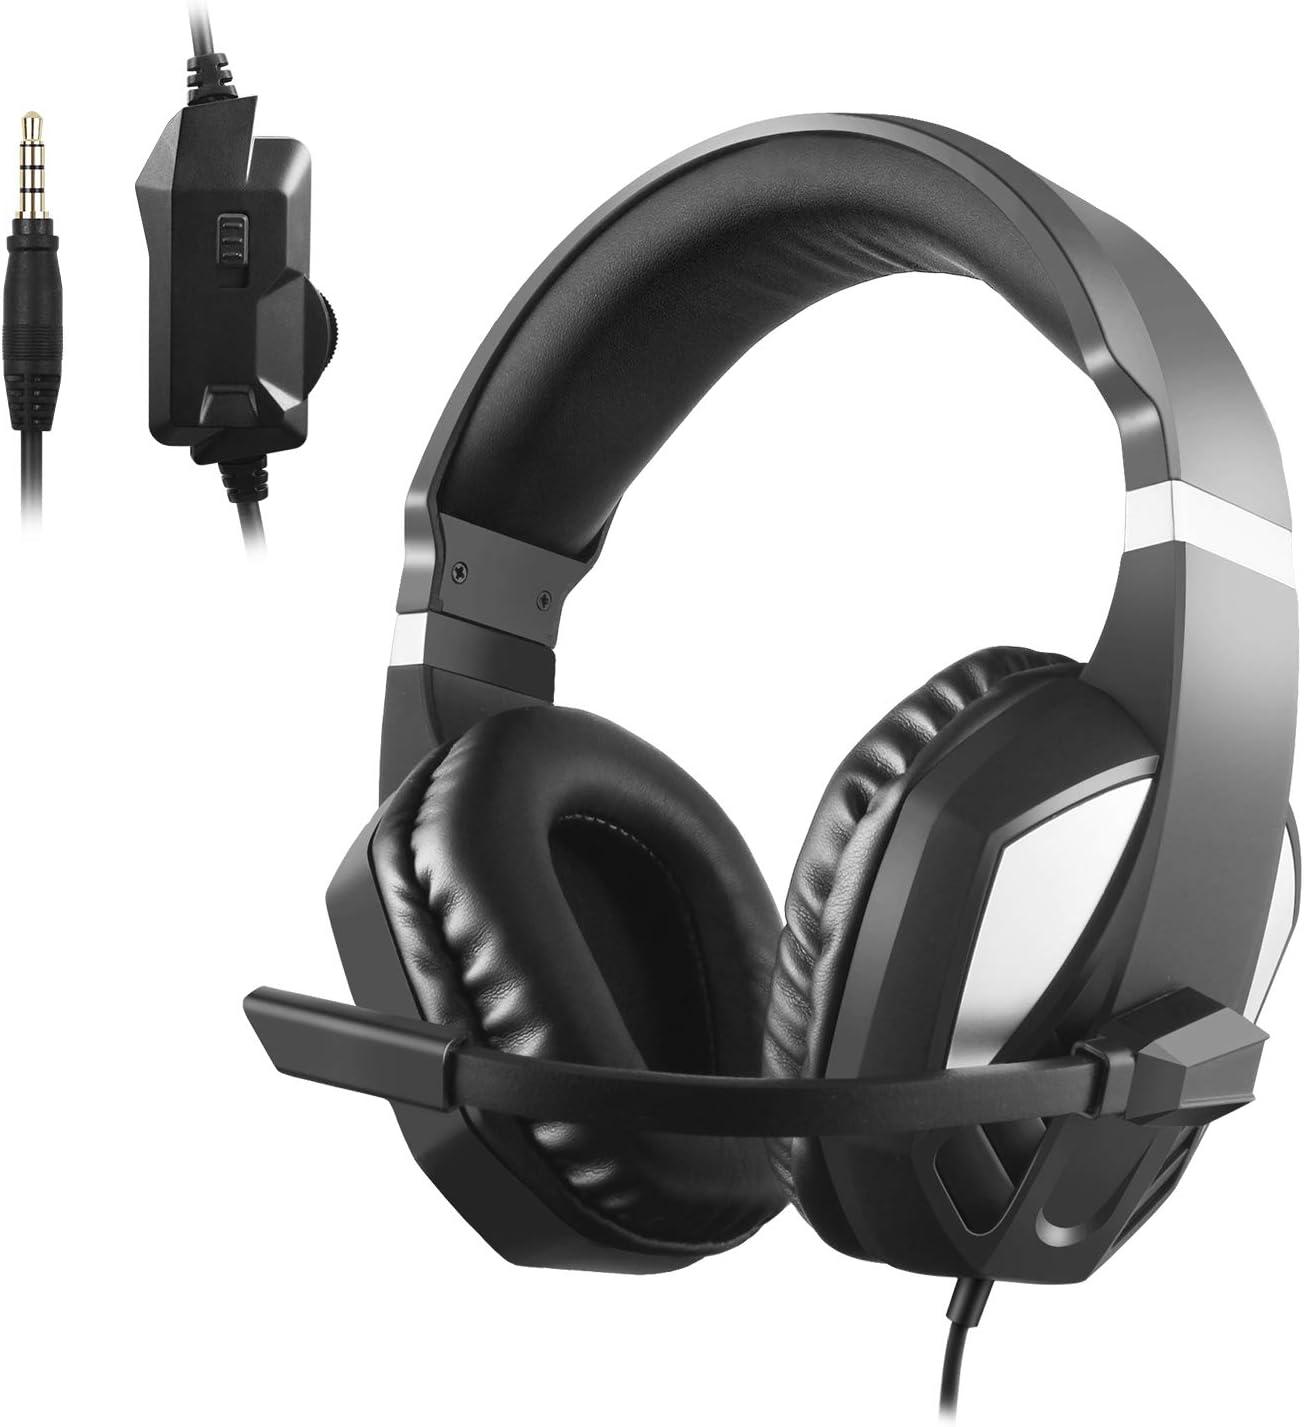 D.Va headset looks flawless